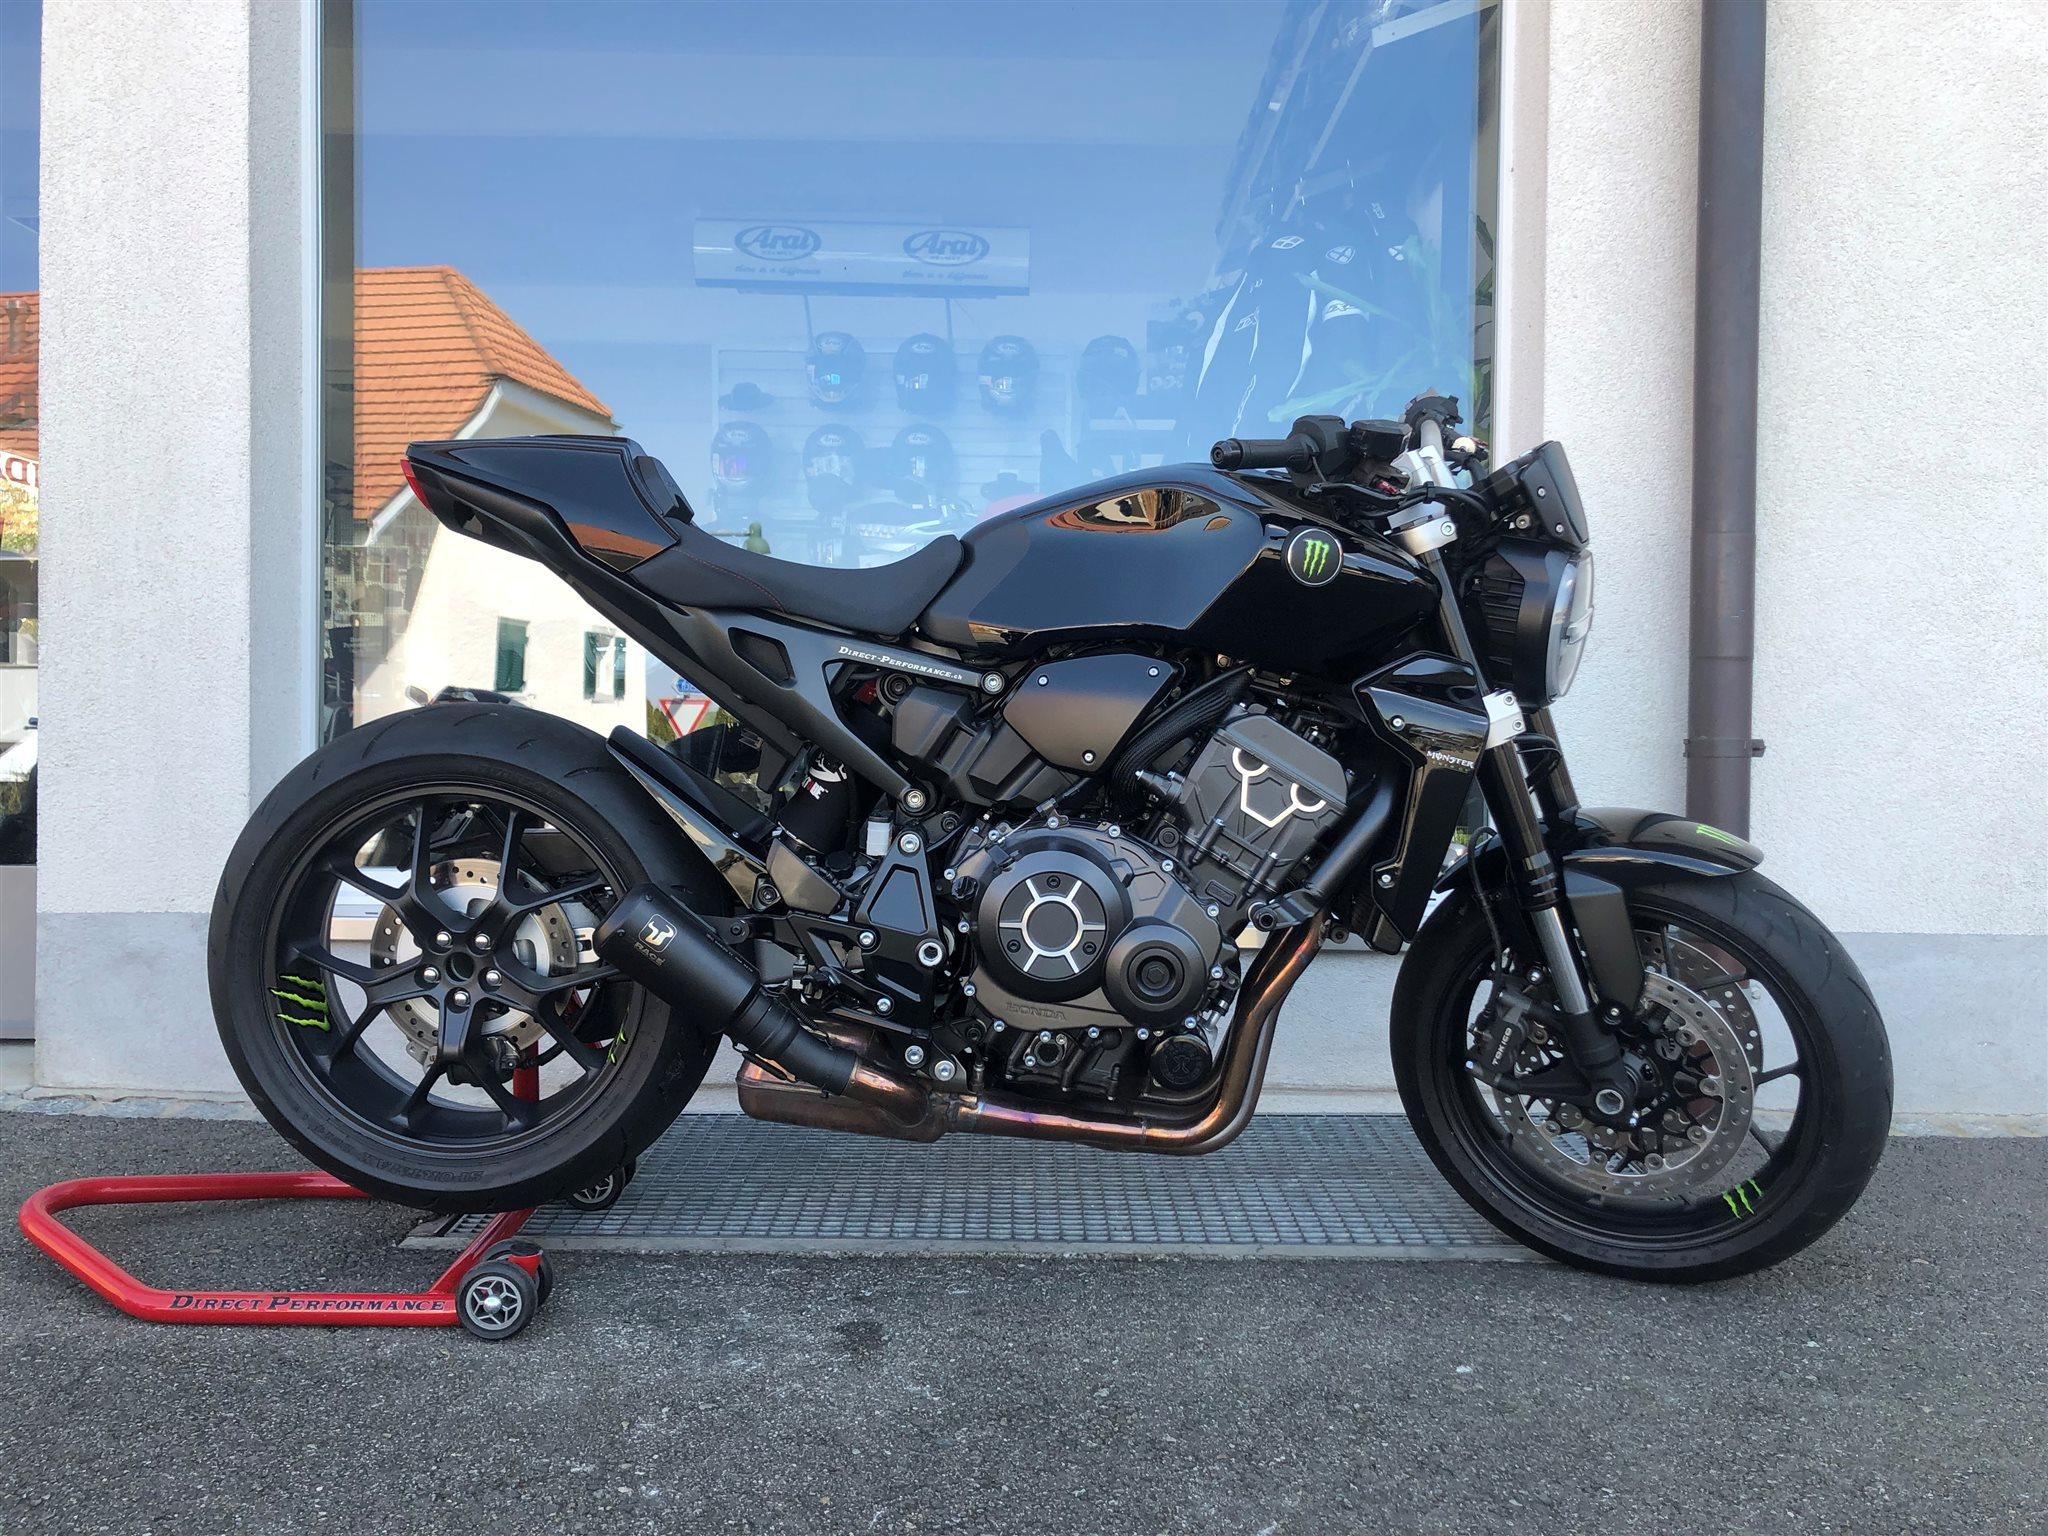 Details zum Custom-Bike Honda CB 1000 R des Händlers